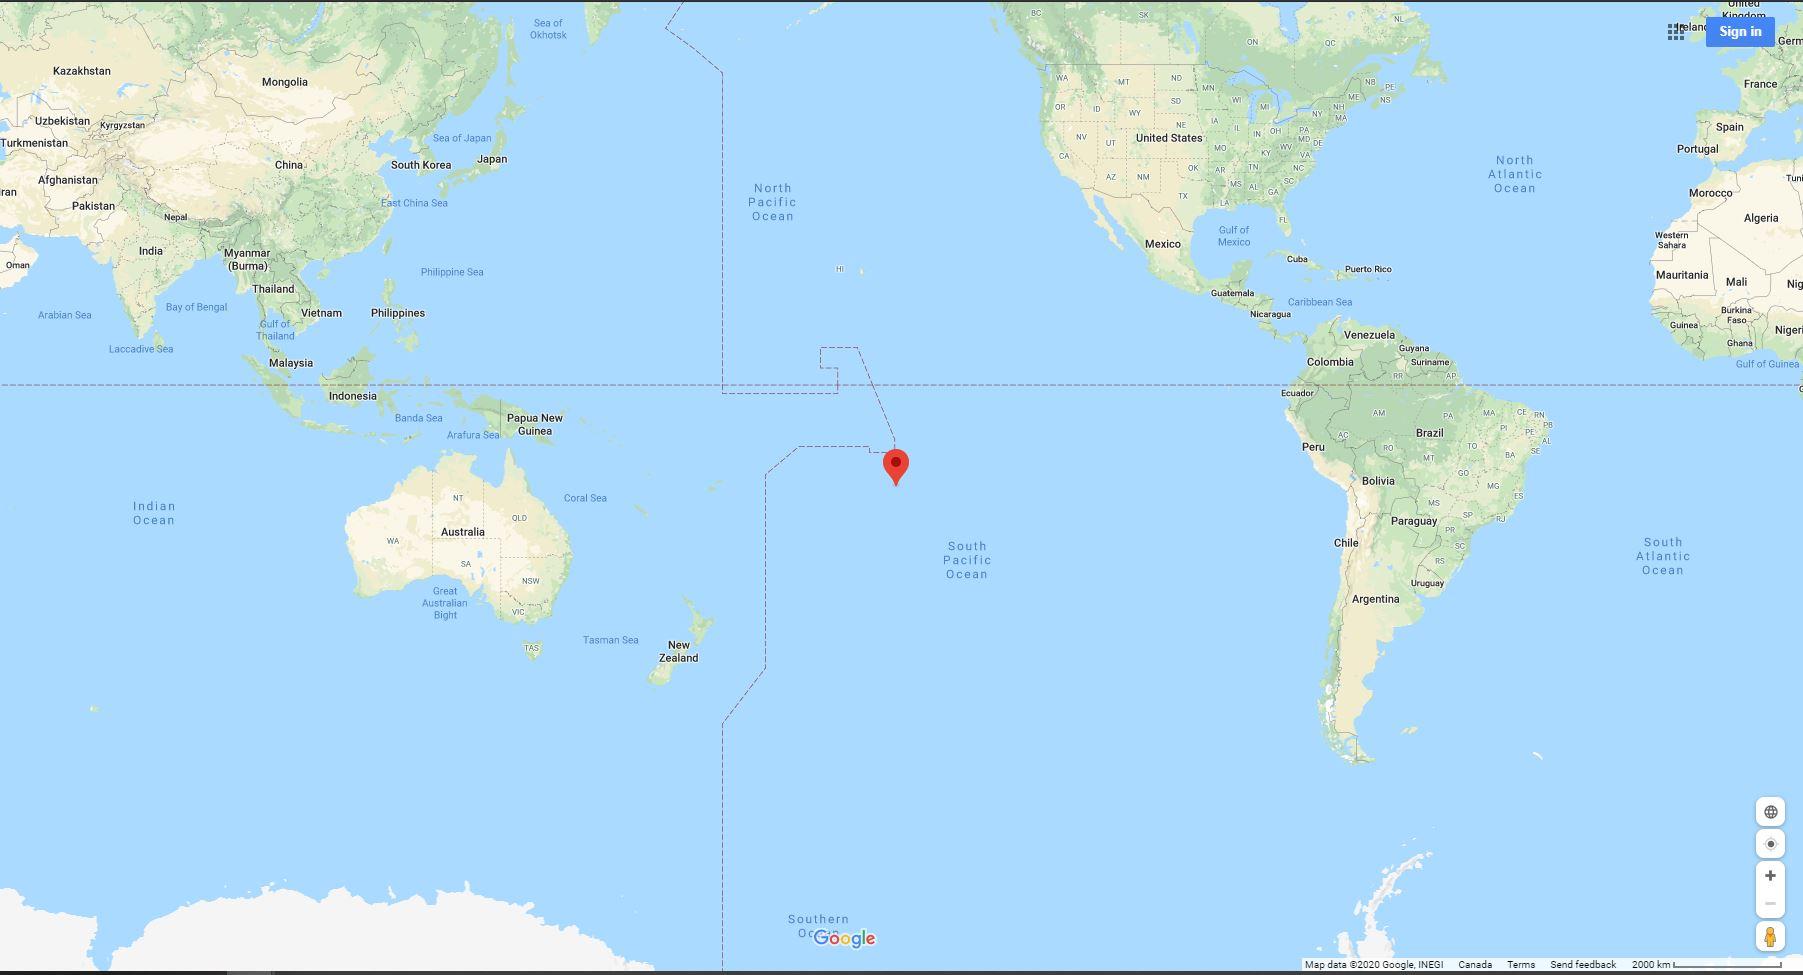 Google Map of French Polynesia